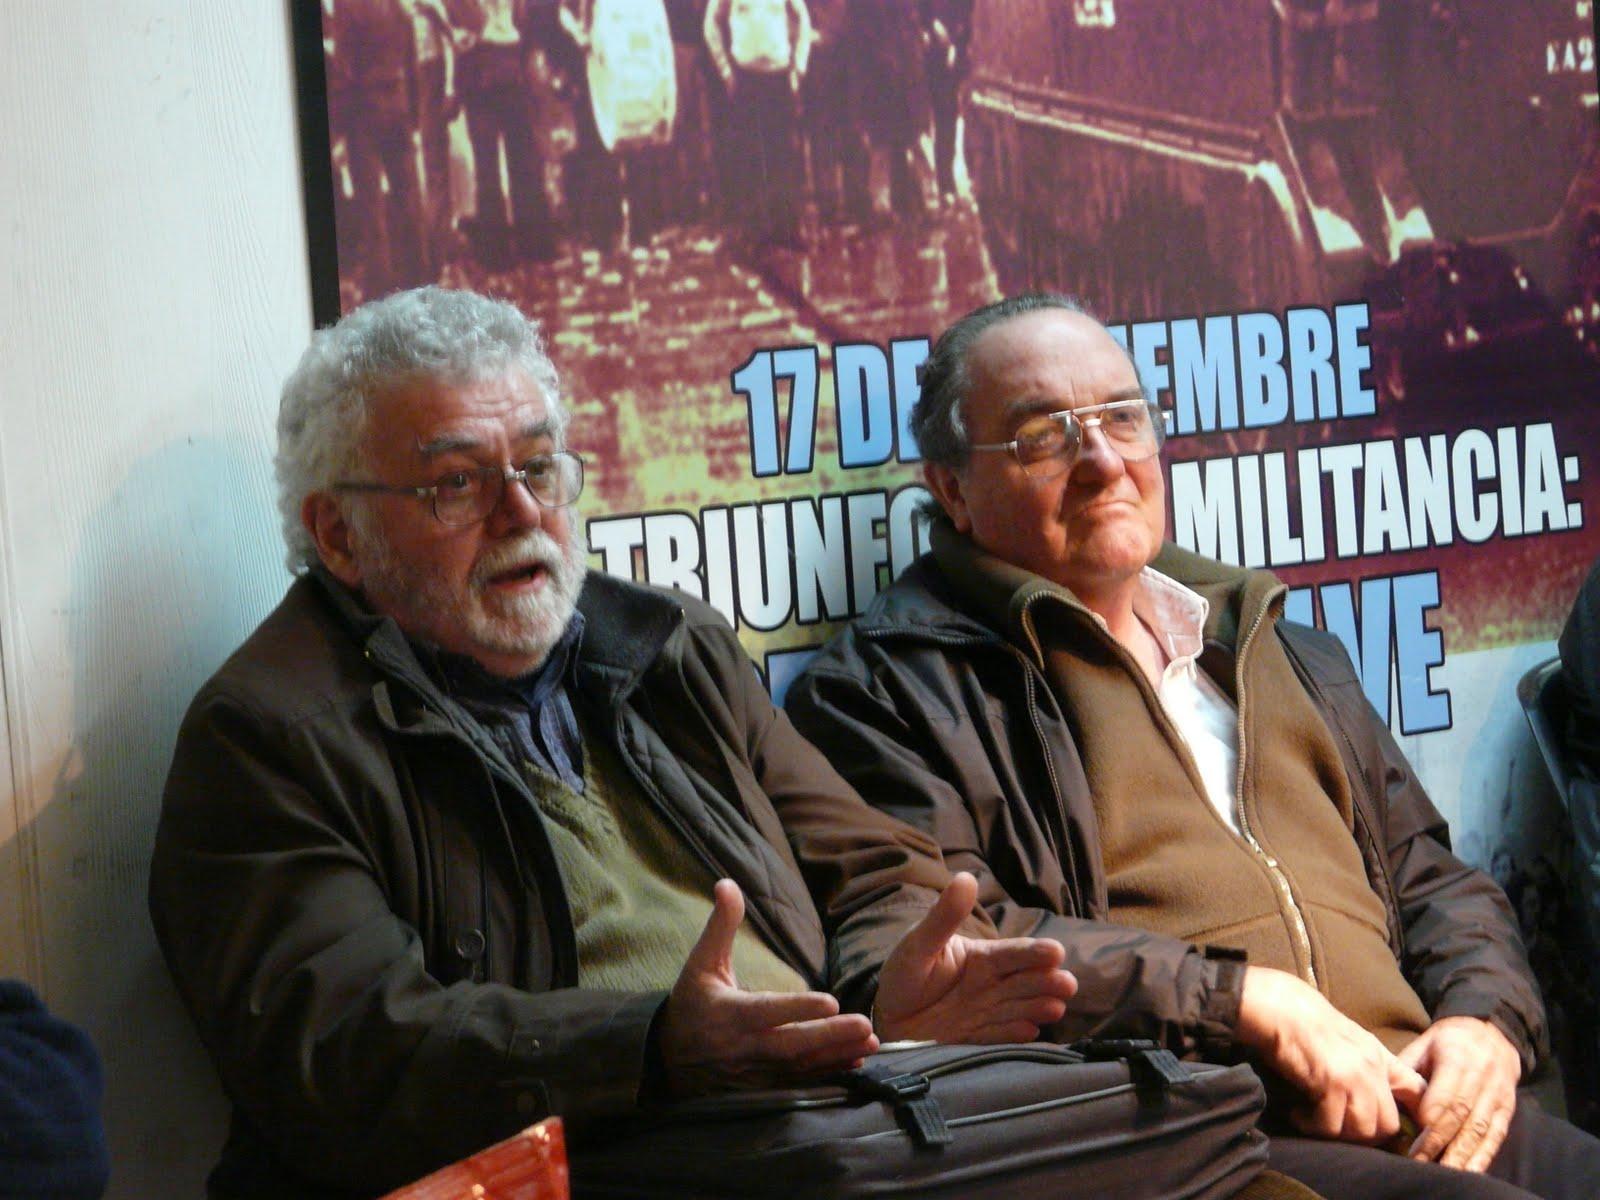 https://www.nodo50.org/exilioargentino/cambio2013CEAM/2010/2010_09_septiembre/sept_2010_images/pecorino_y_rafa.JPG